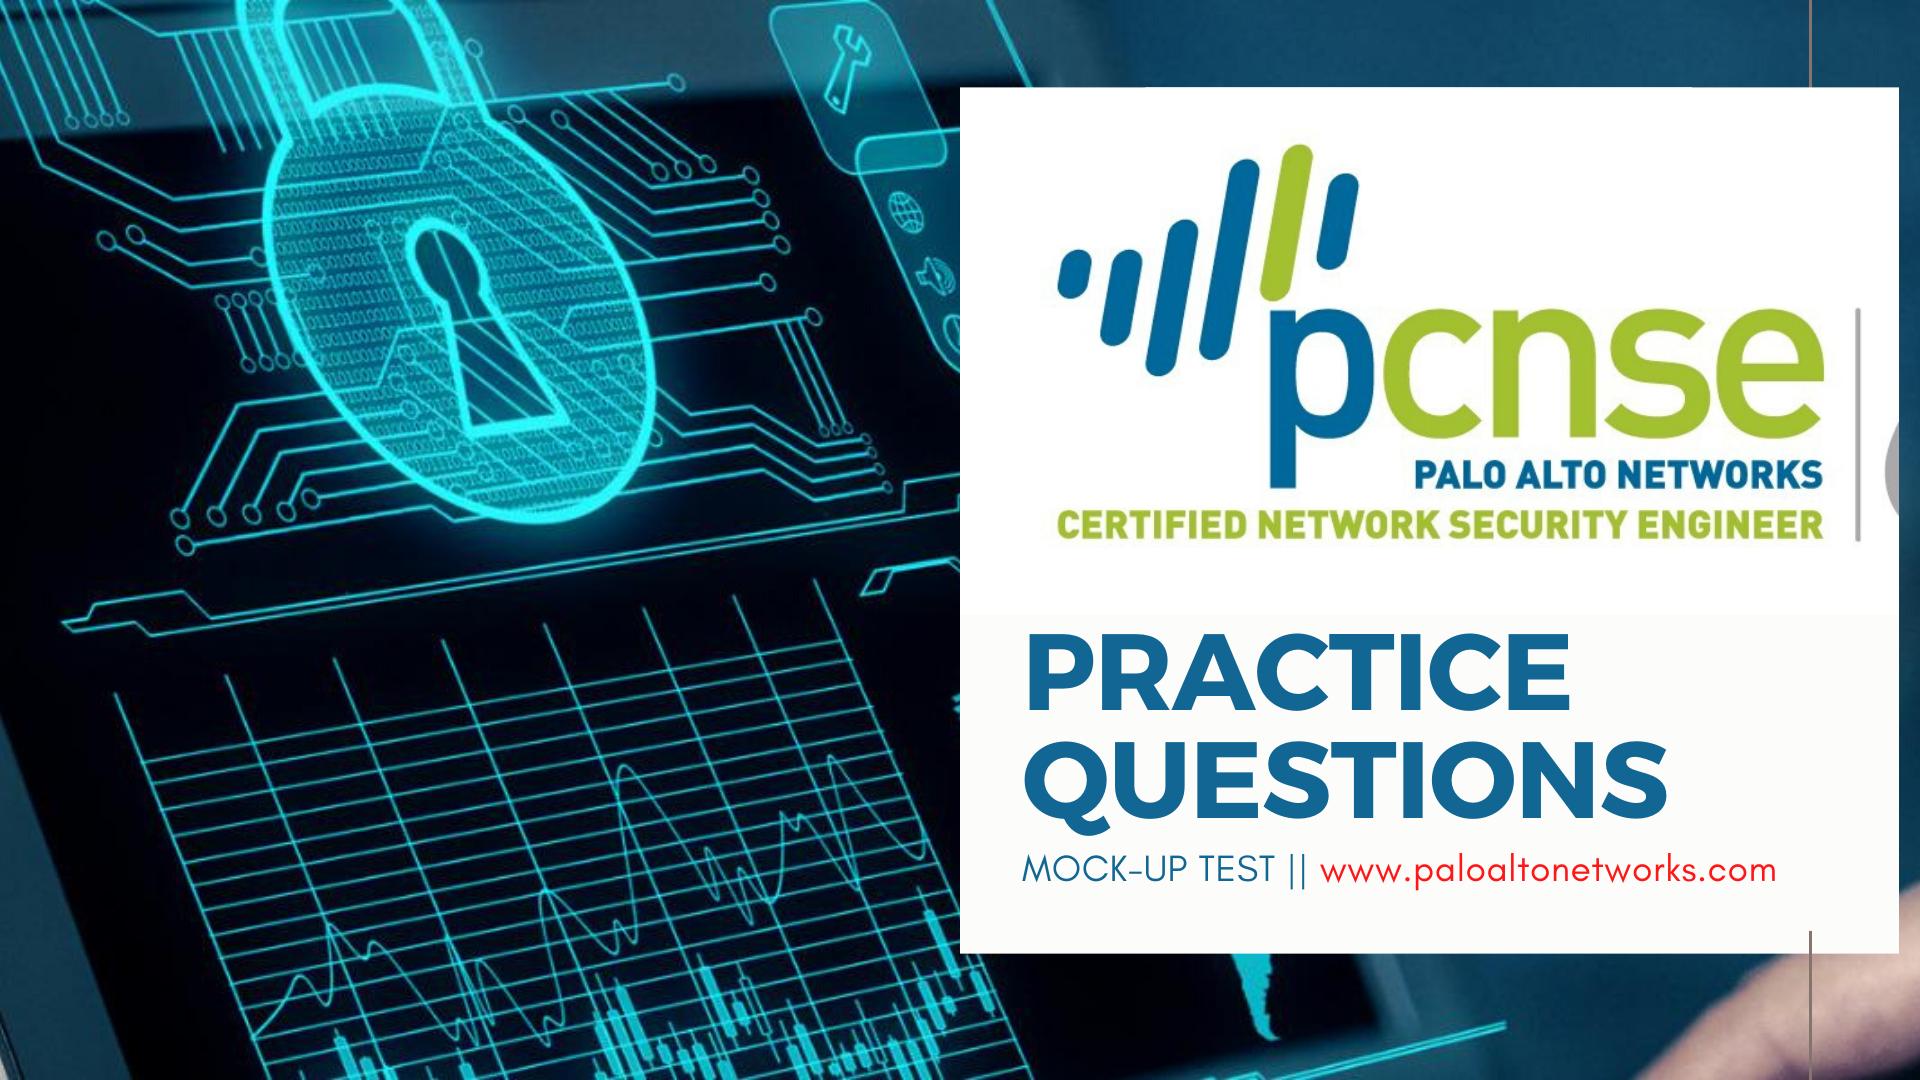 PCNSE paloaltonetworks.com Practice test mockup questions